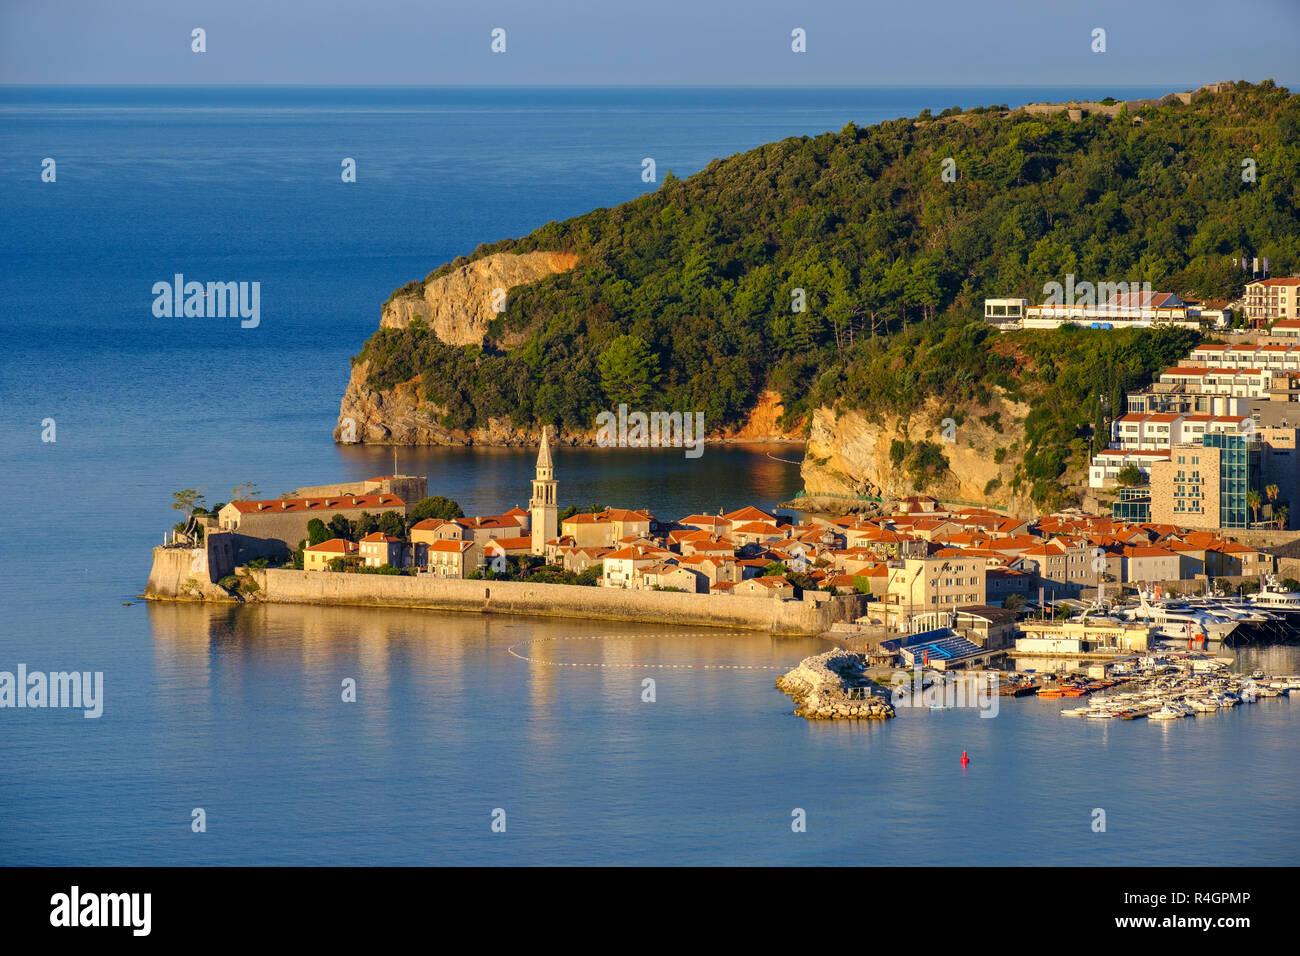 Old Town, Budva, Adriatic Coast, Montenegro - Stock Image